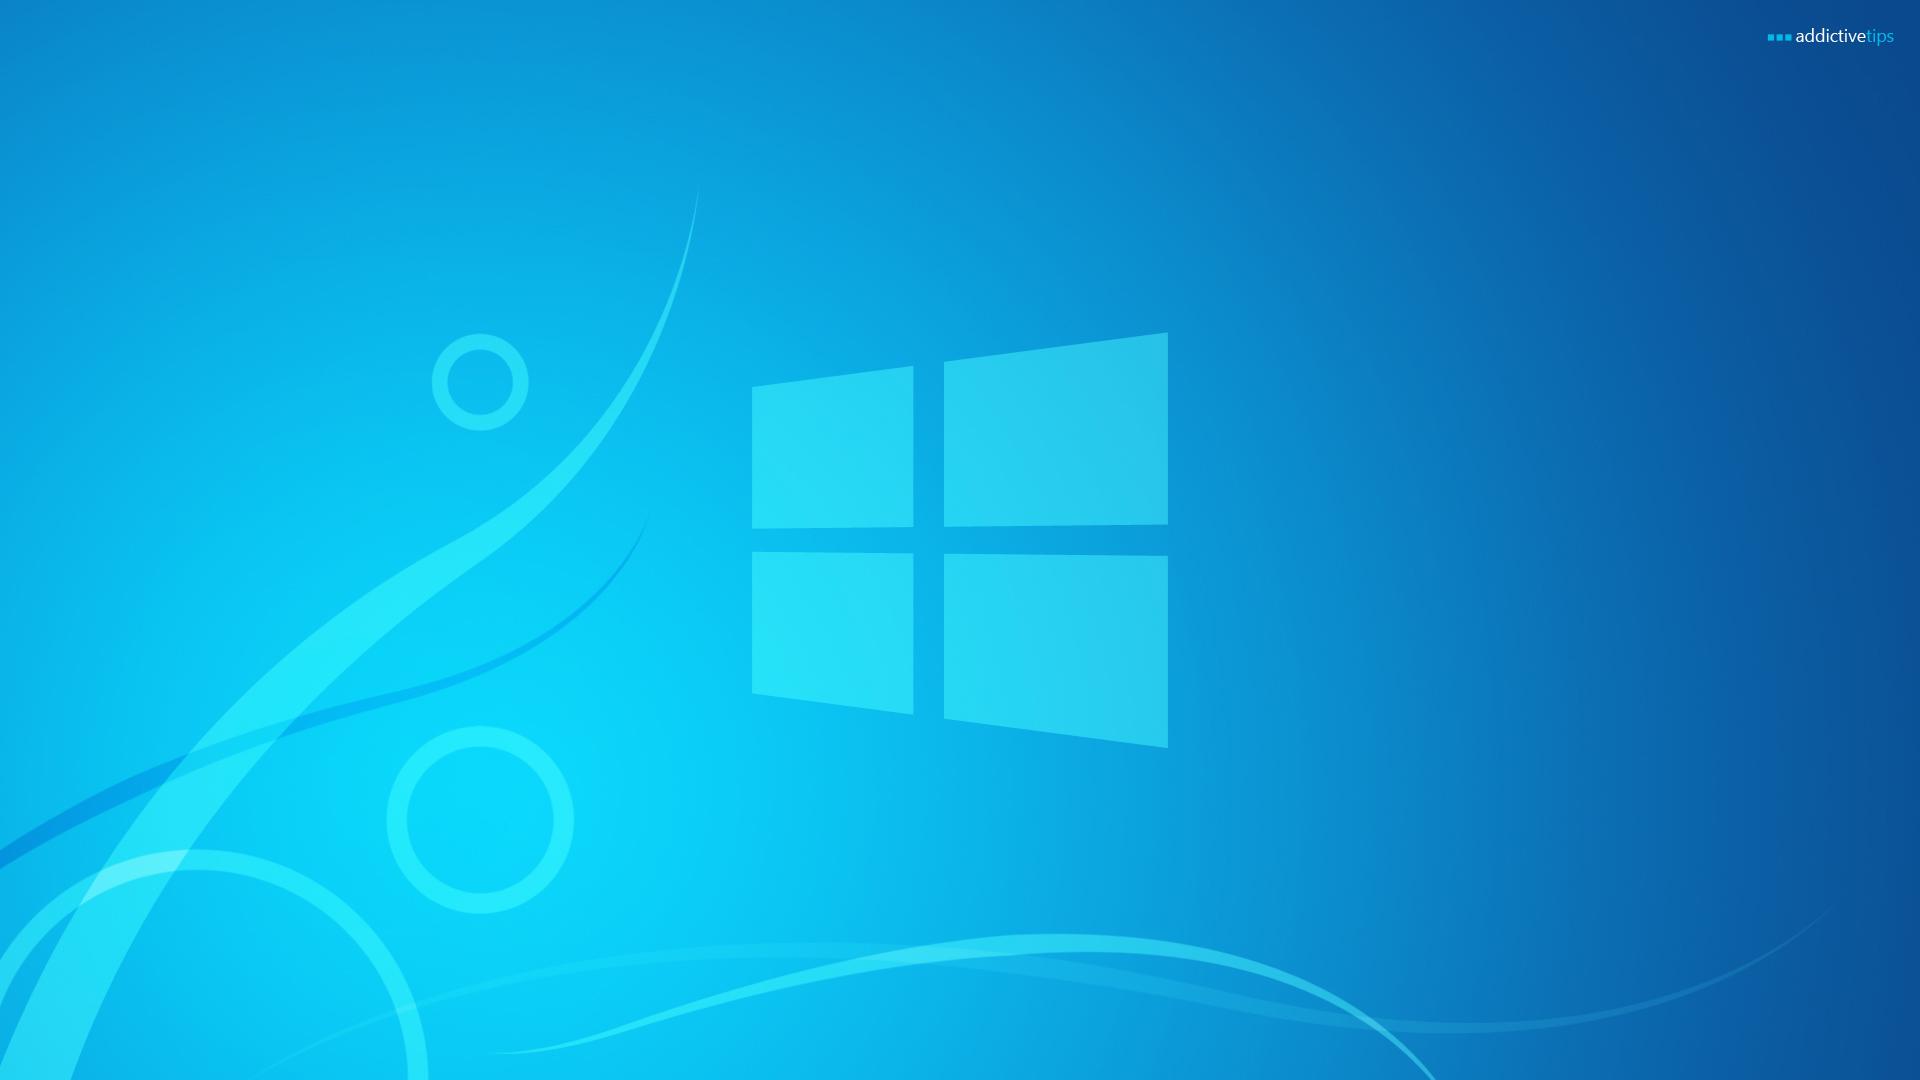 Windows 8 Wallpaper Windows 7 Spinoff 2 1jpg 1920x1080